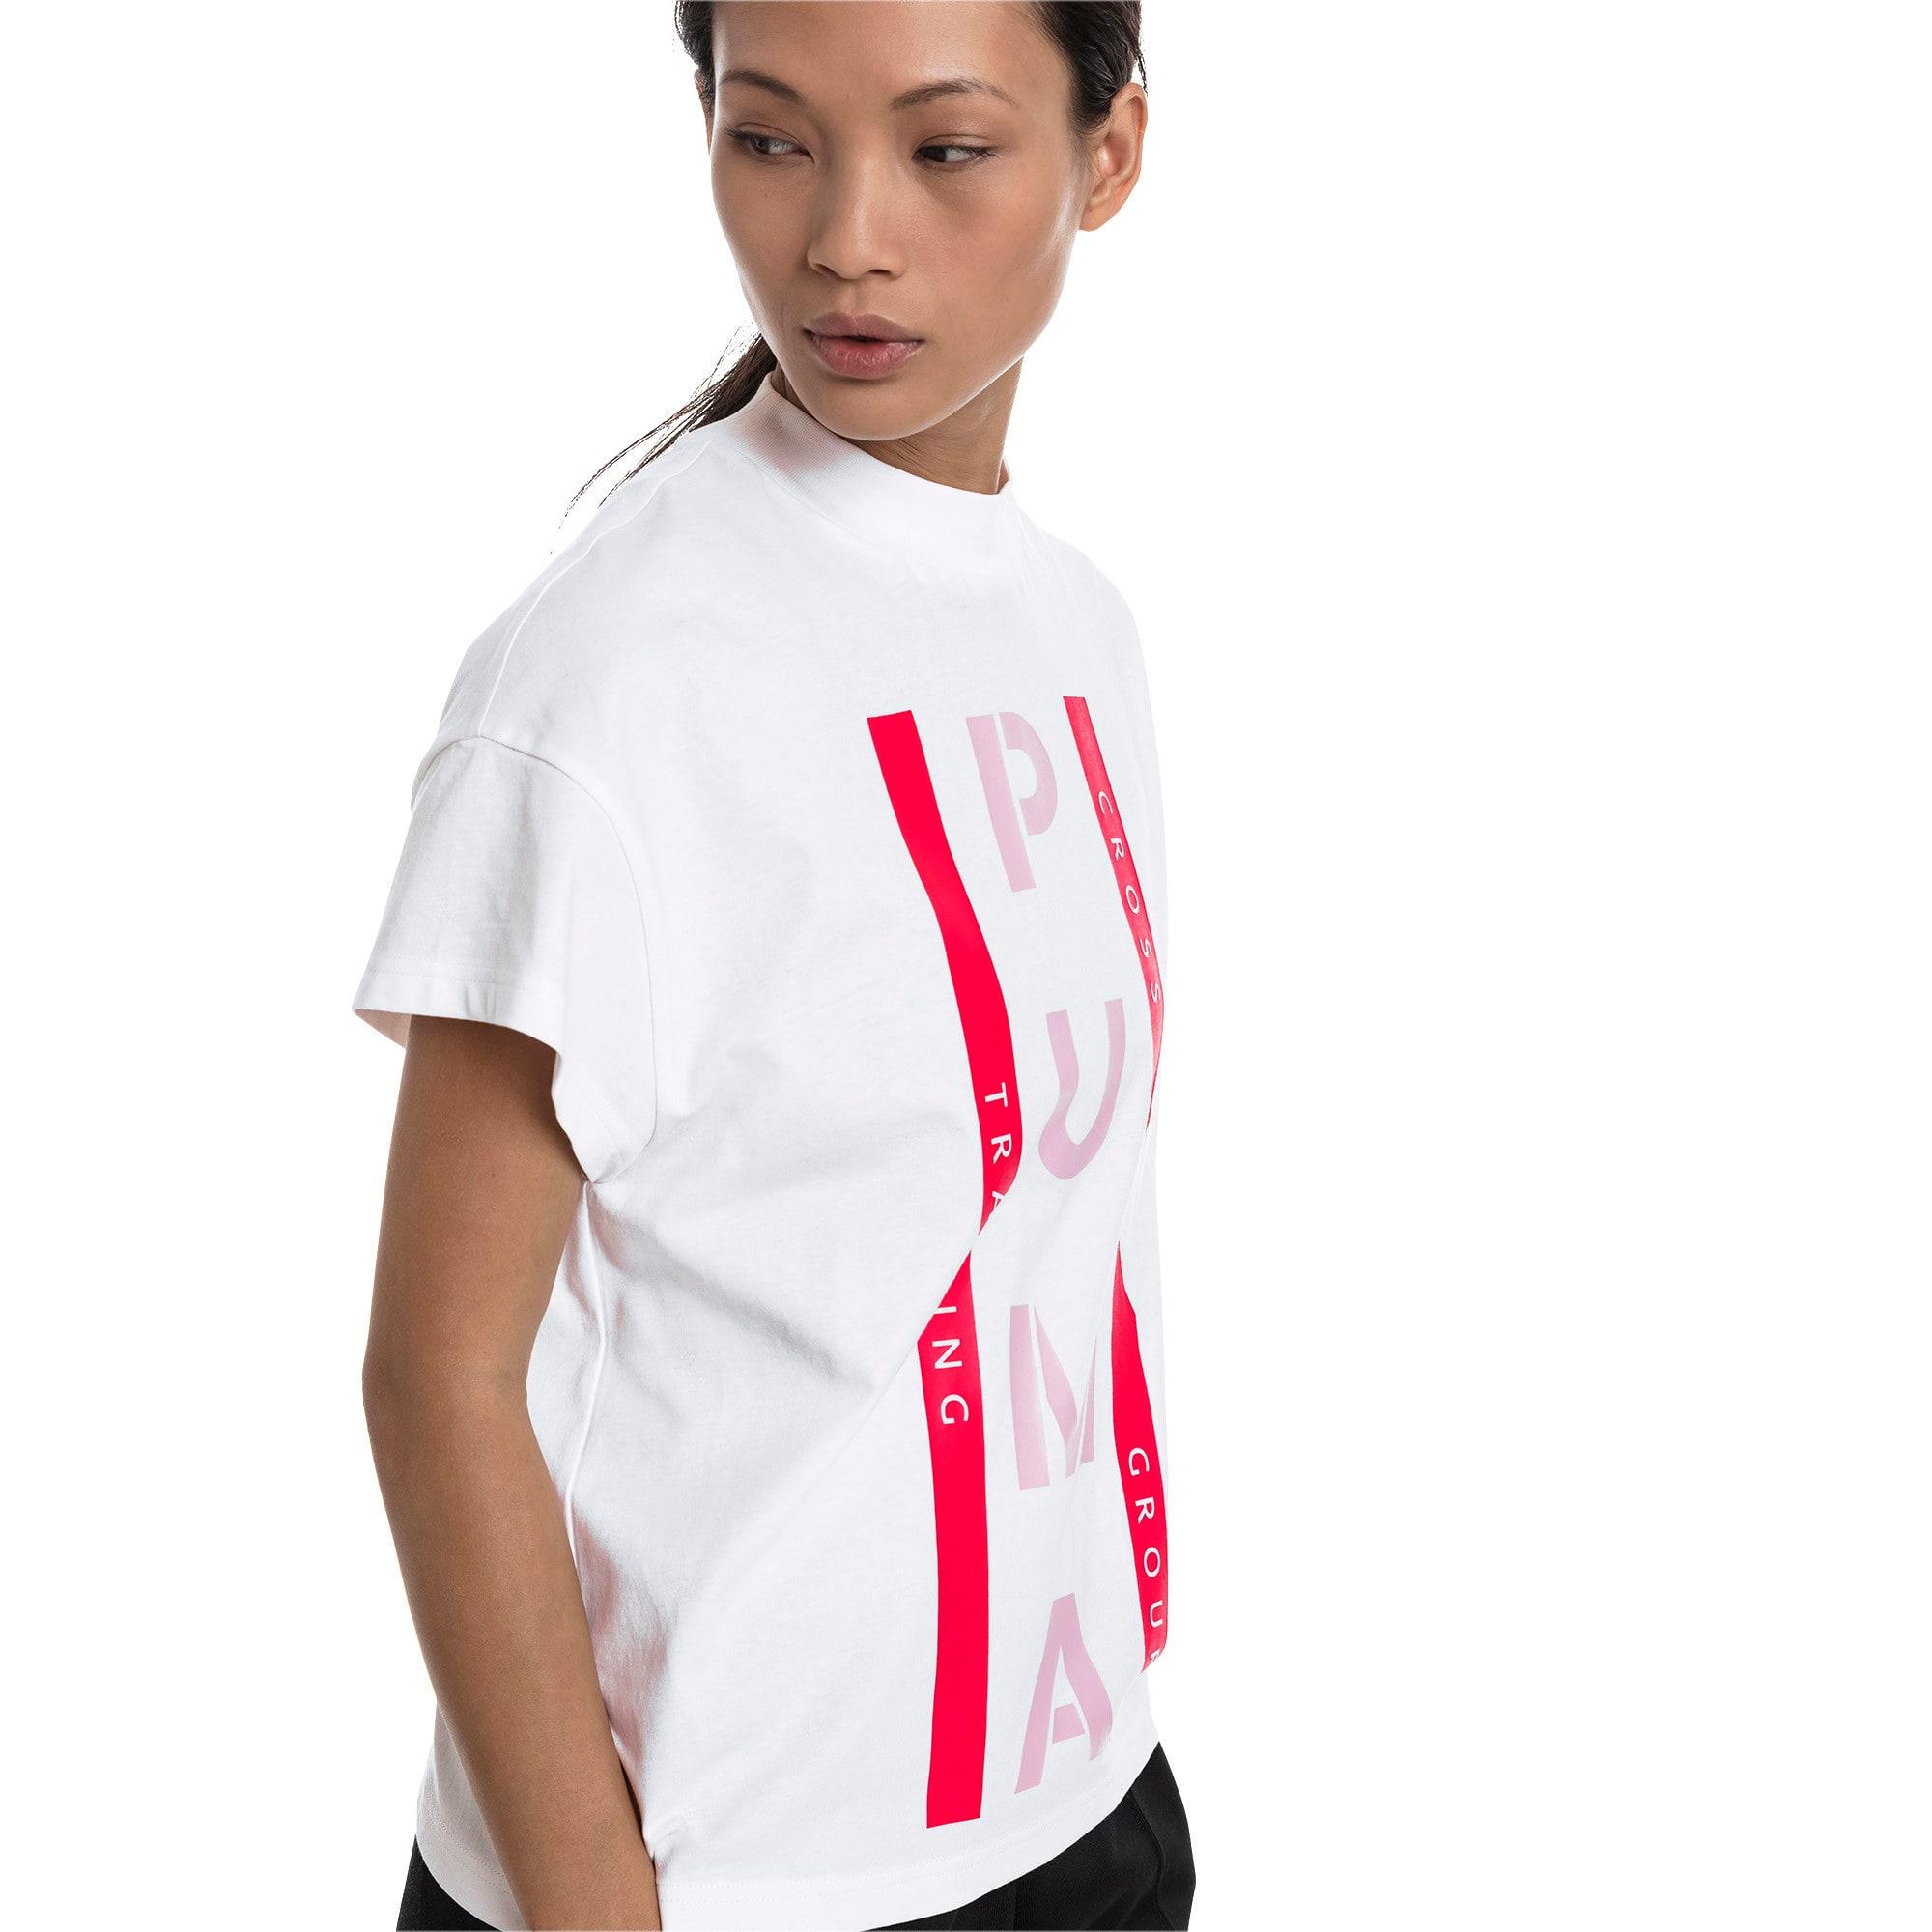 Thumbnail 2 of PUMA XTG グラフィック ウィメンズ SS Tシャツ 半袖, Puma White, medium-JPN